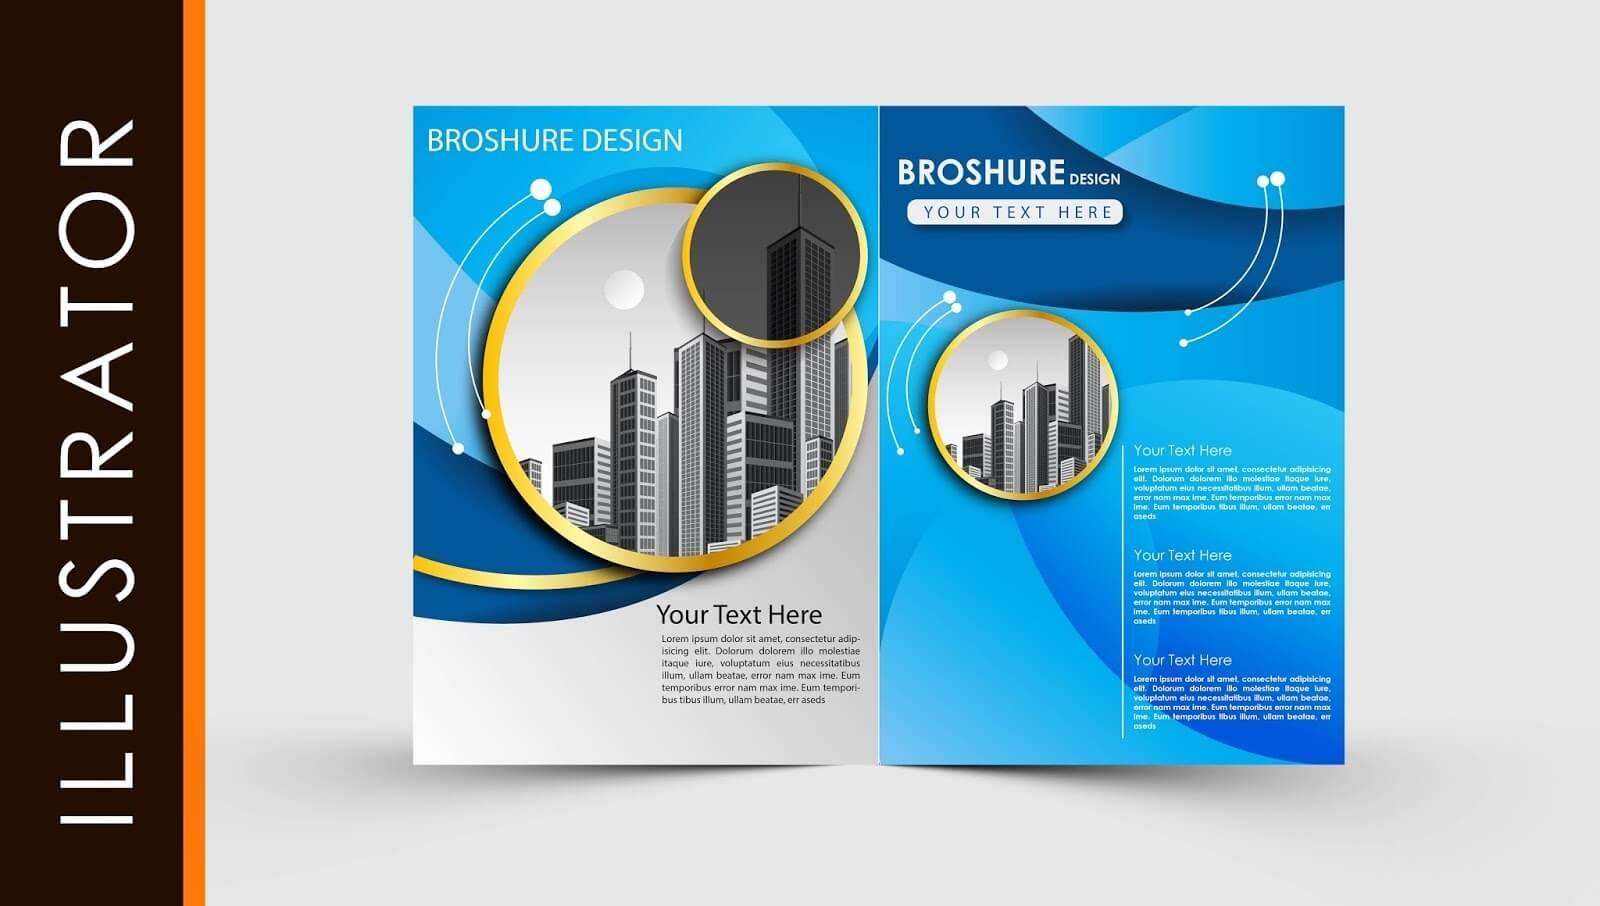 Free Download Adobe Illustrator Template Brochure Two Fold Inside Brochure Templates Adobe Illustrator